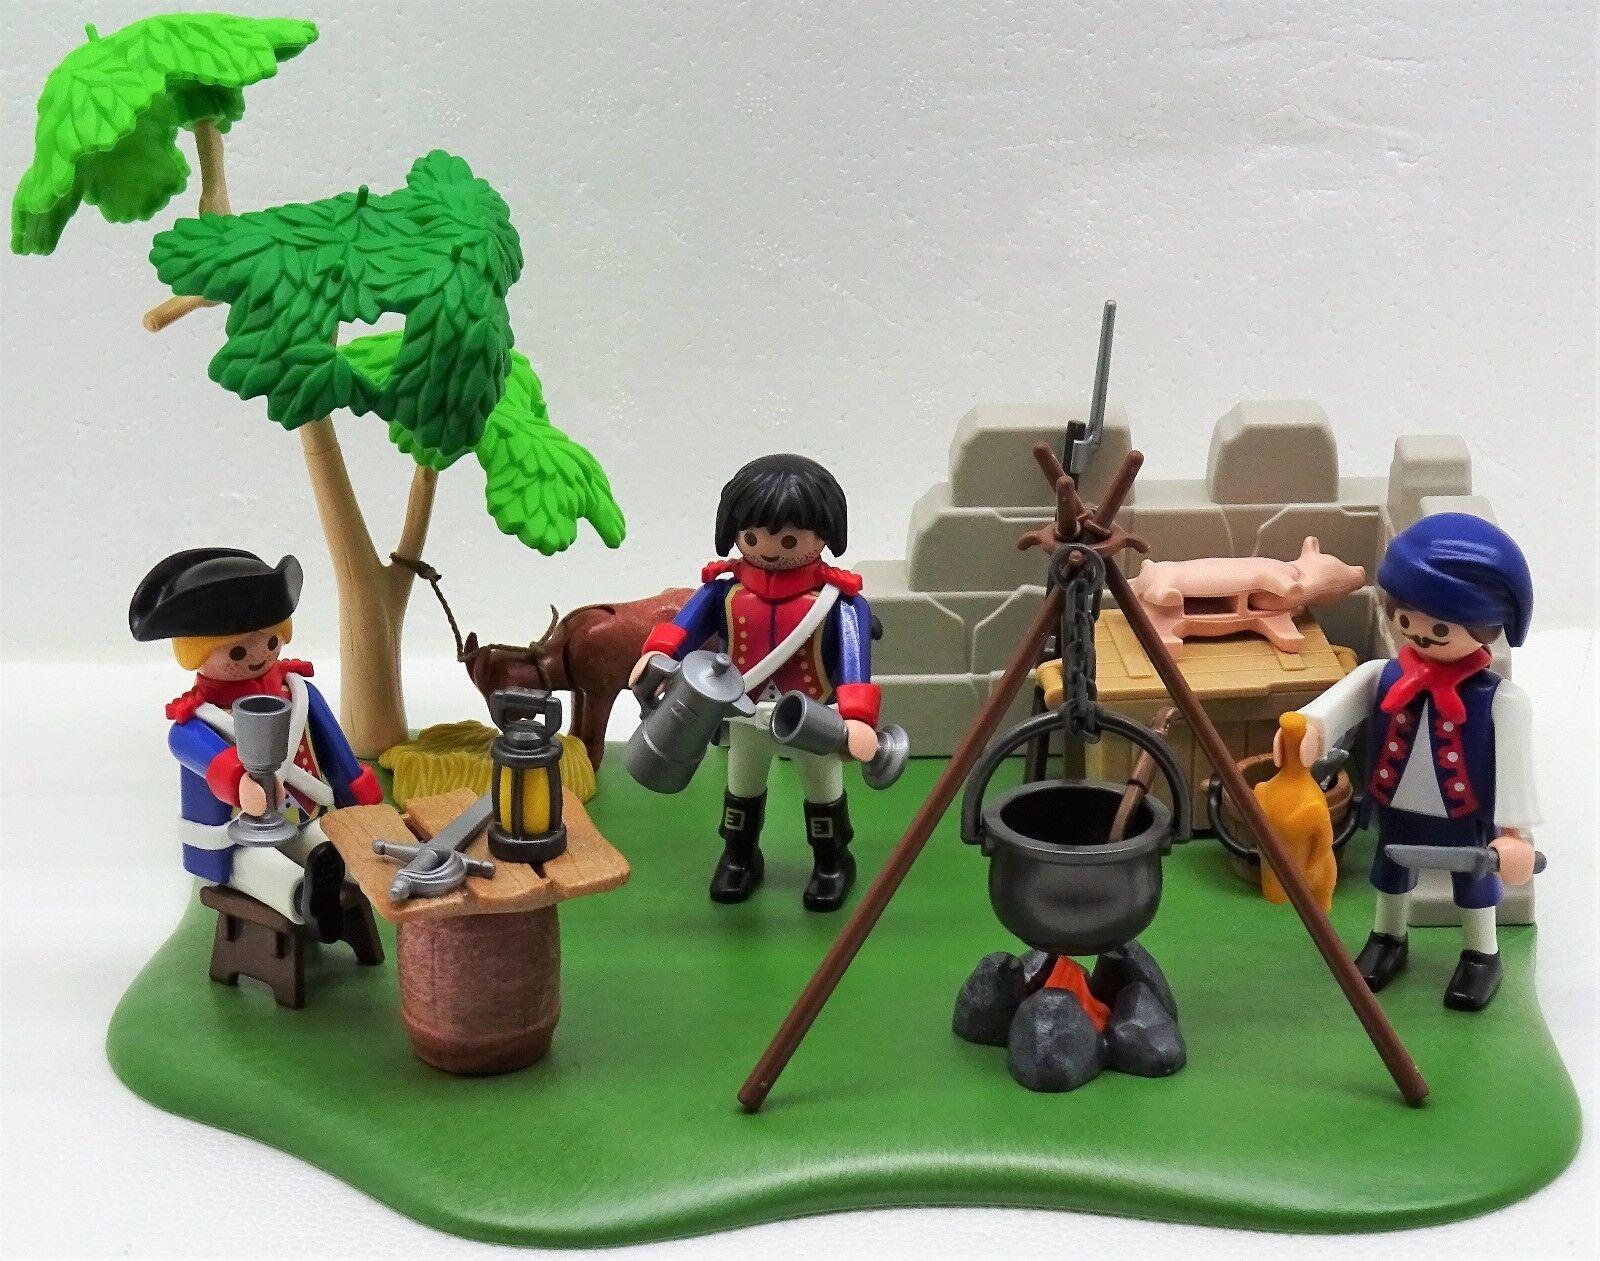 FRANZOSEN FELDLAGER Playmobil zu Garde vs. Rotröcke Soldat Napoleonic 1er Empire